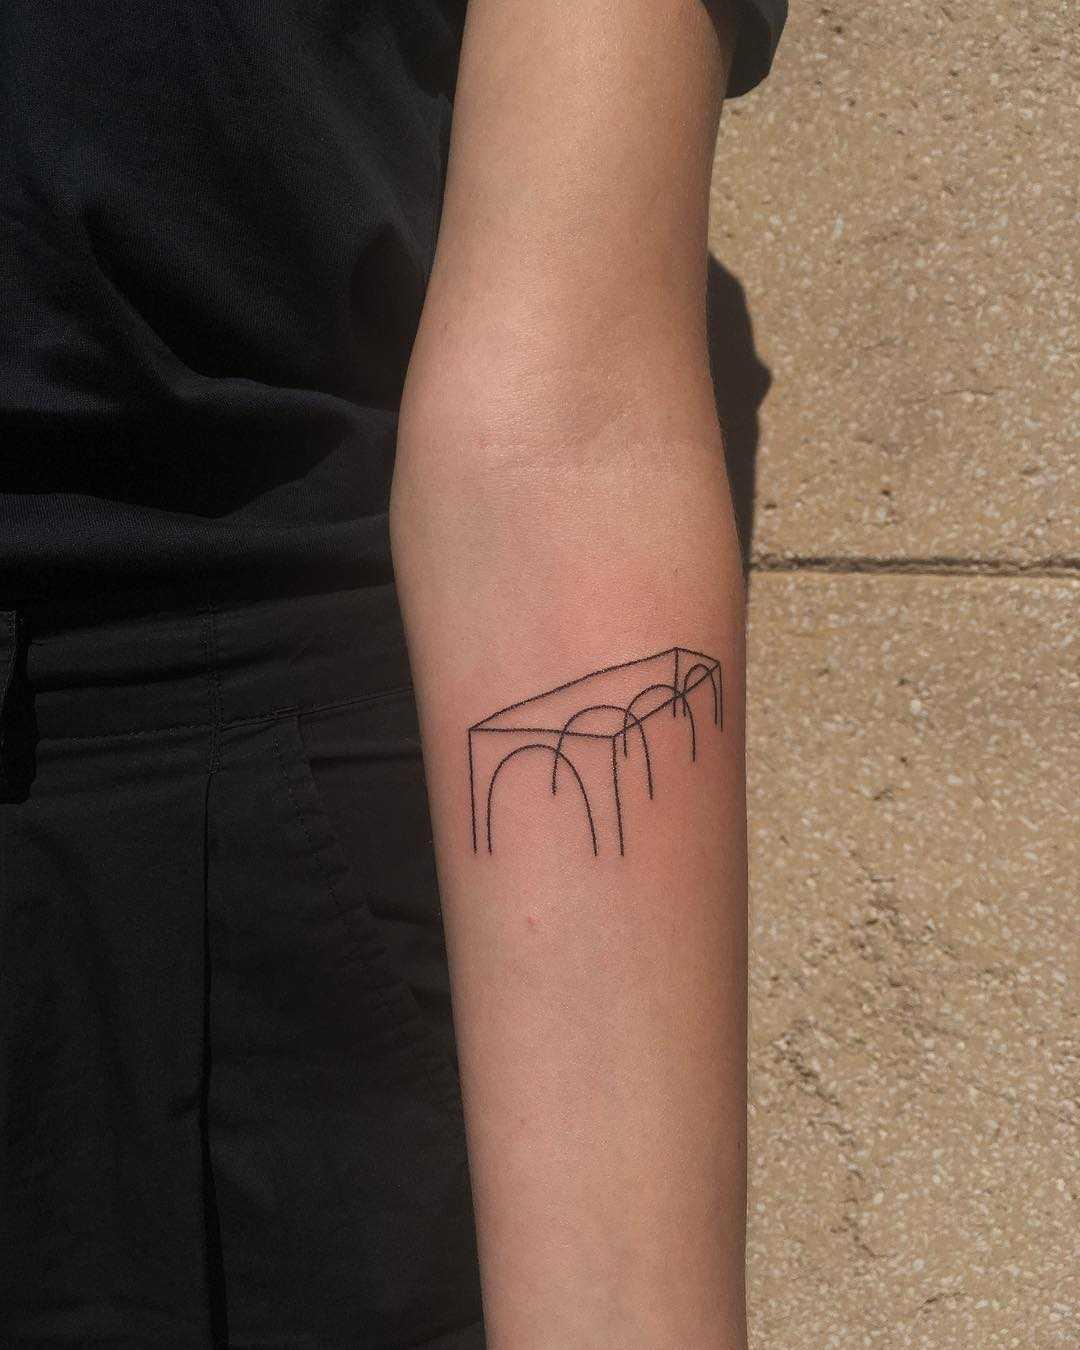 Abstract bridge tattoo by Jessica Rubbish